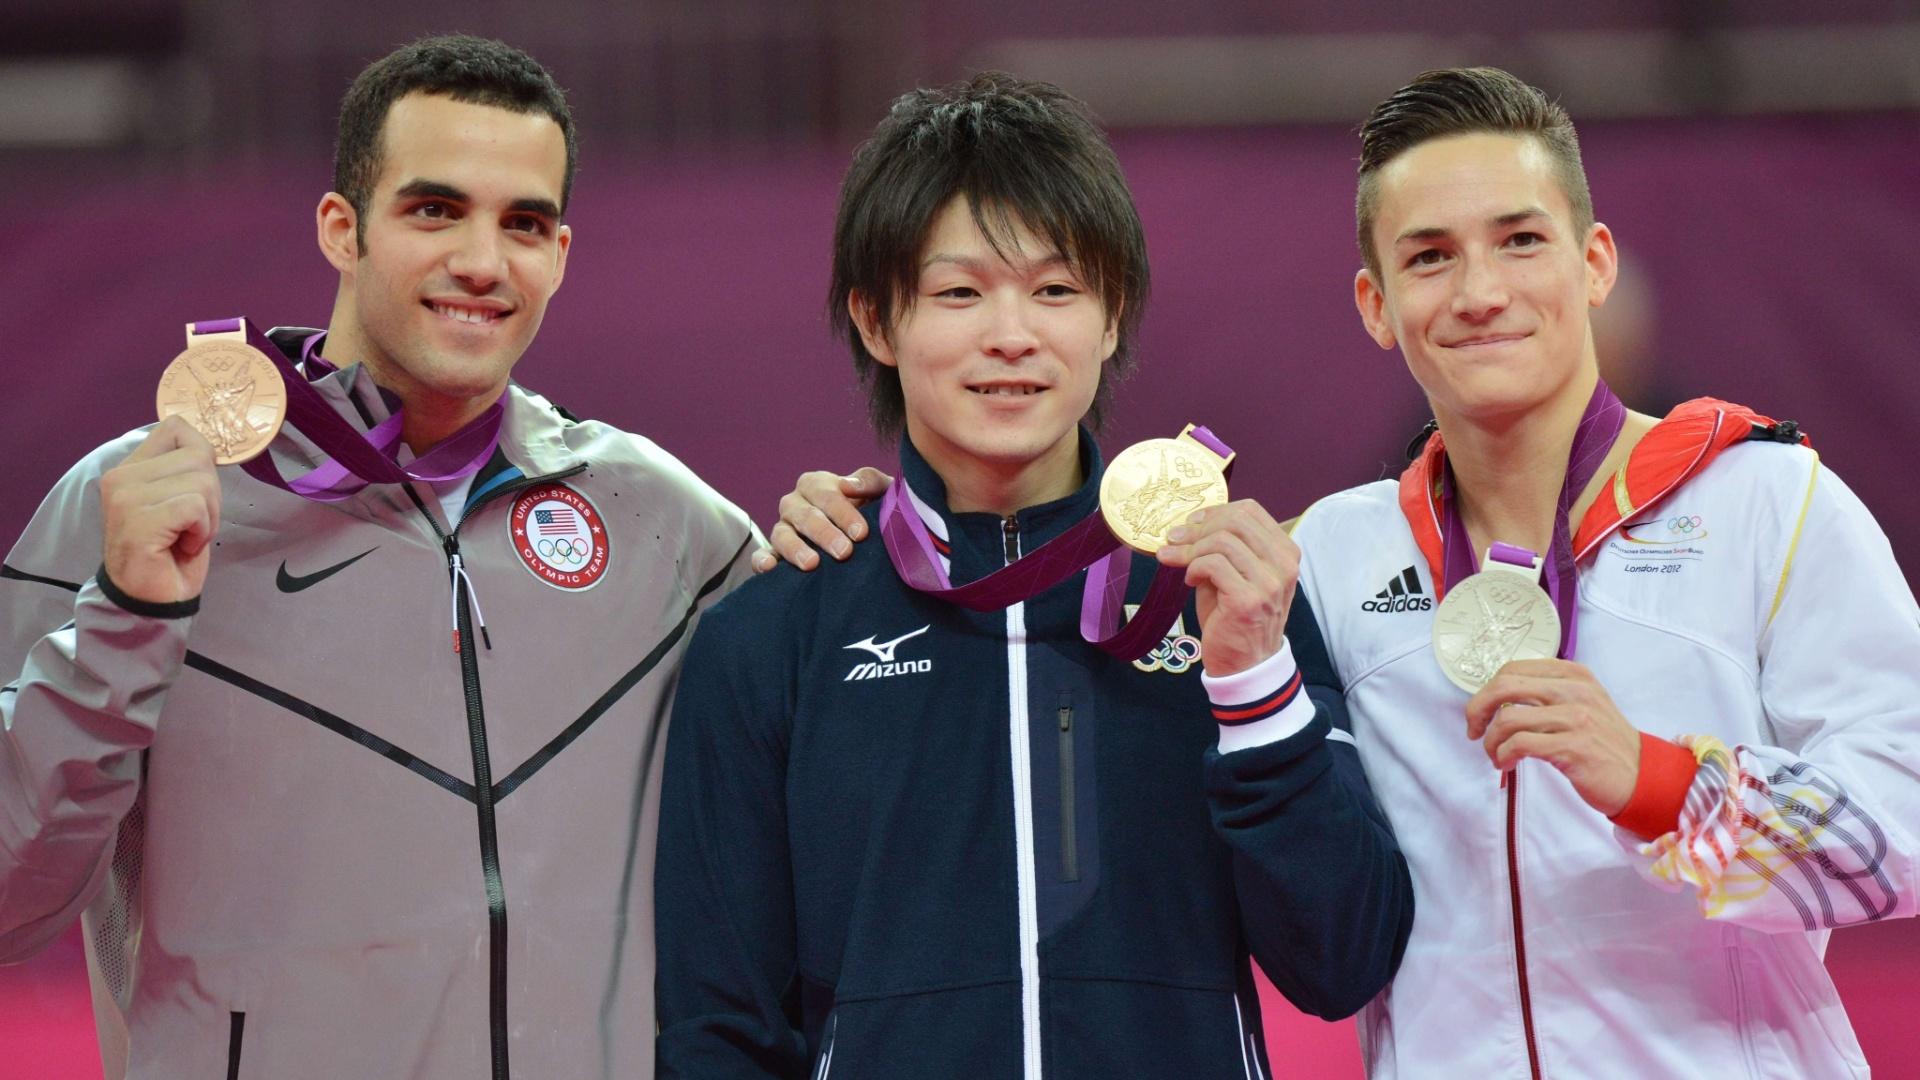 Danell Leyva (e), Kohei Uchimura (c) e Marcel Nguyen mostram as medalhas de bronze, ouro e prata, respectivamente, conquistadas na final individual geral da ginástica artística